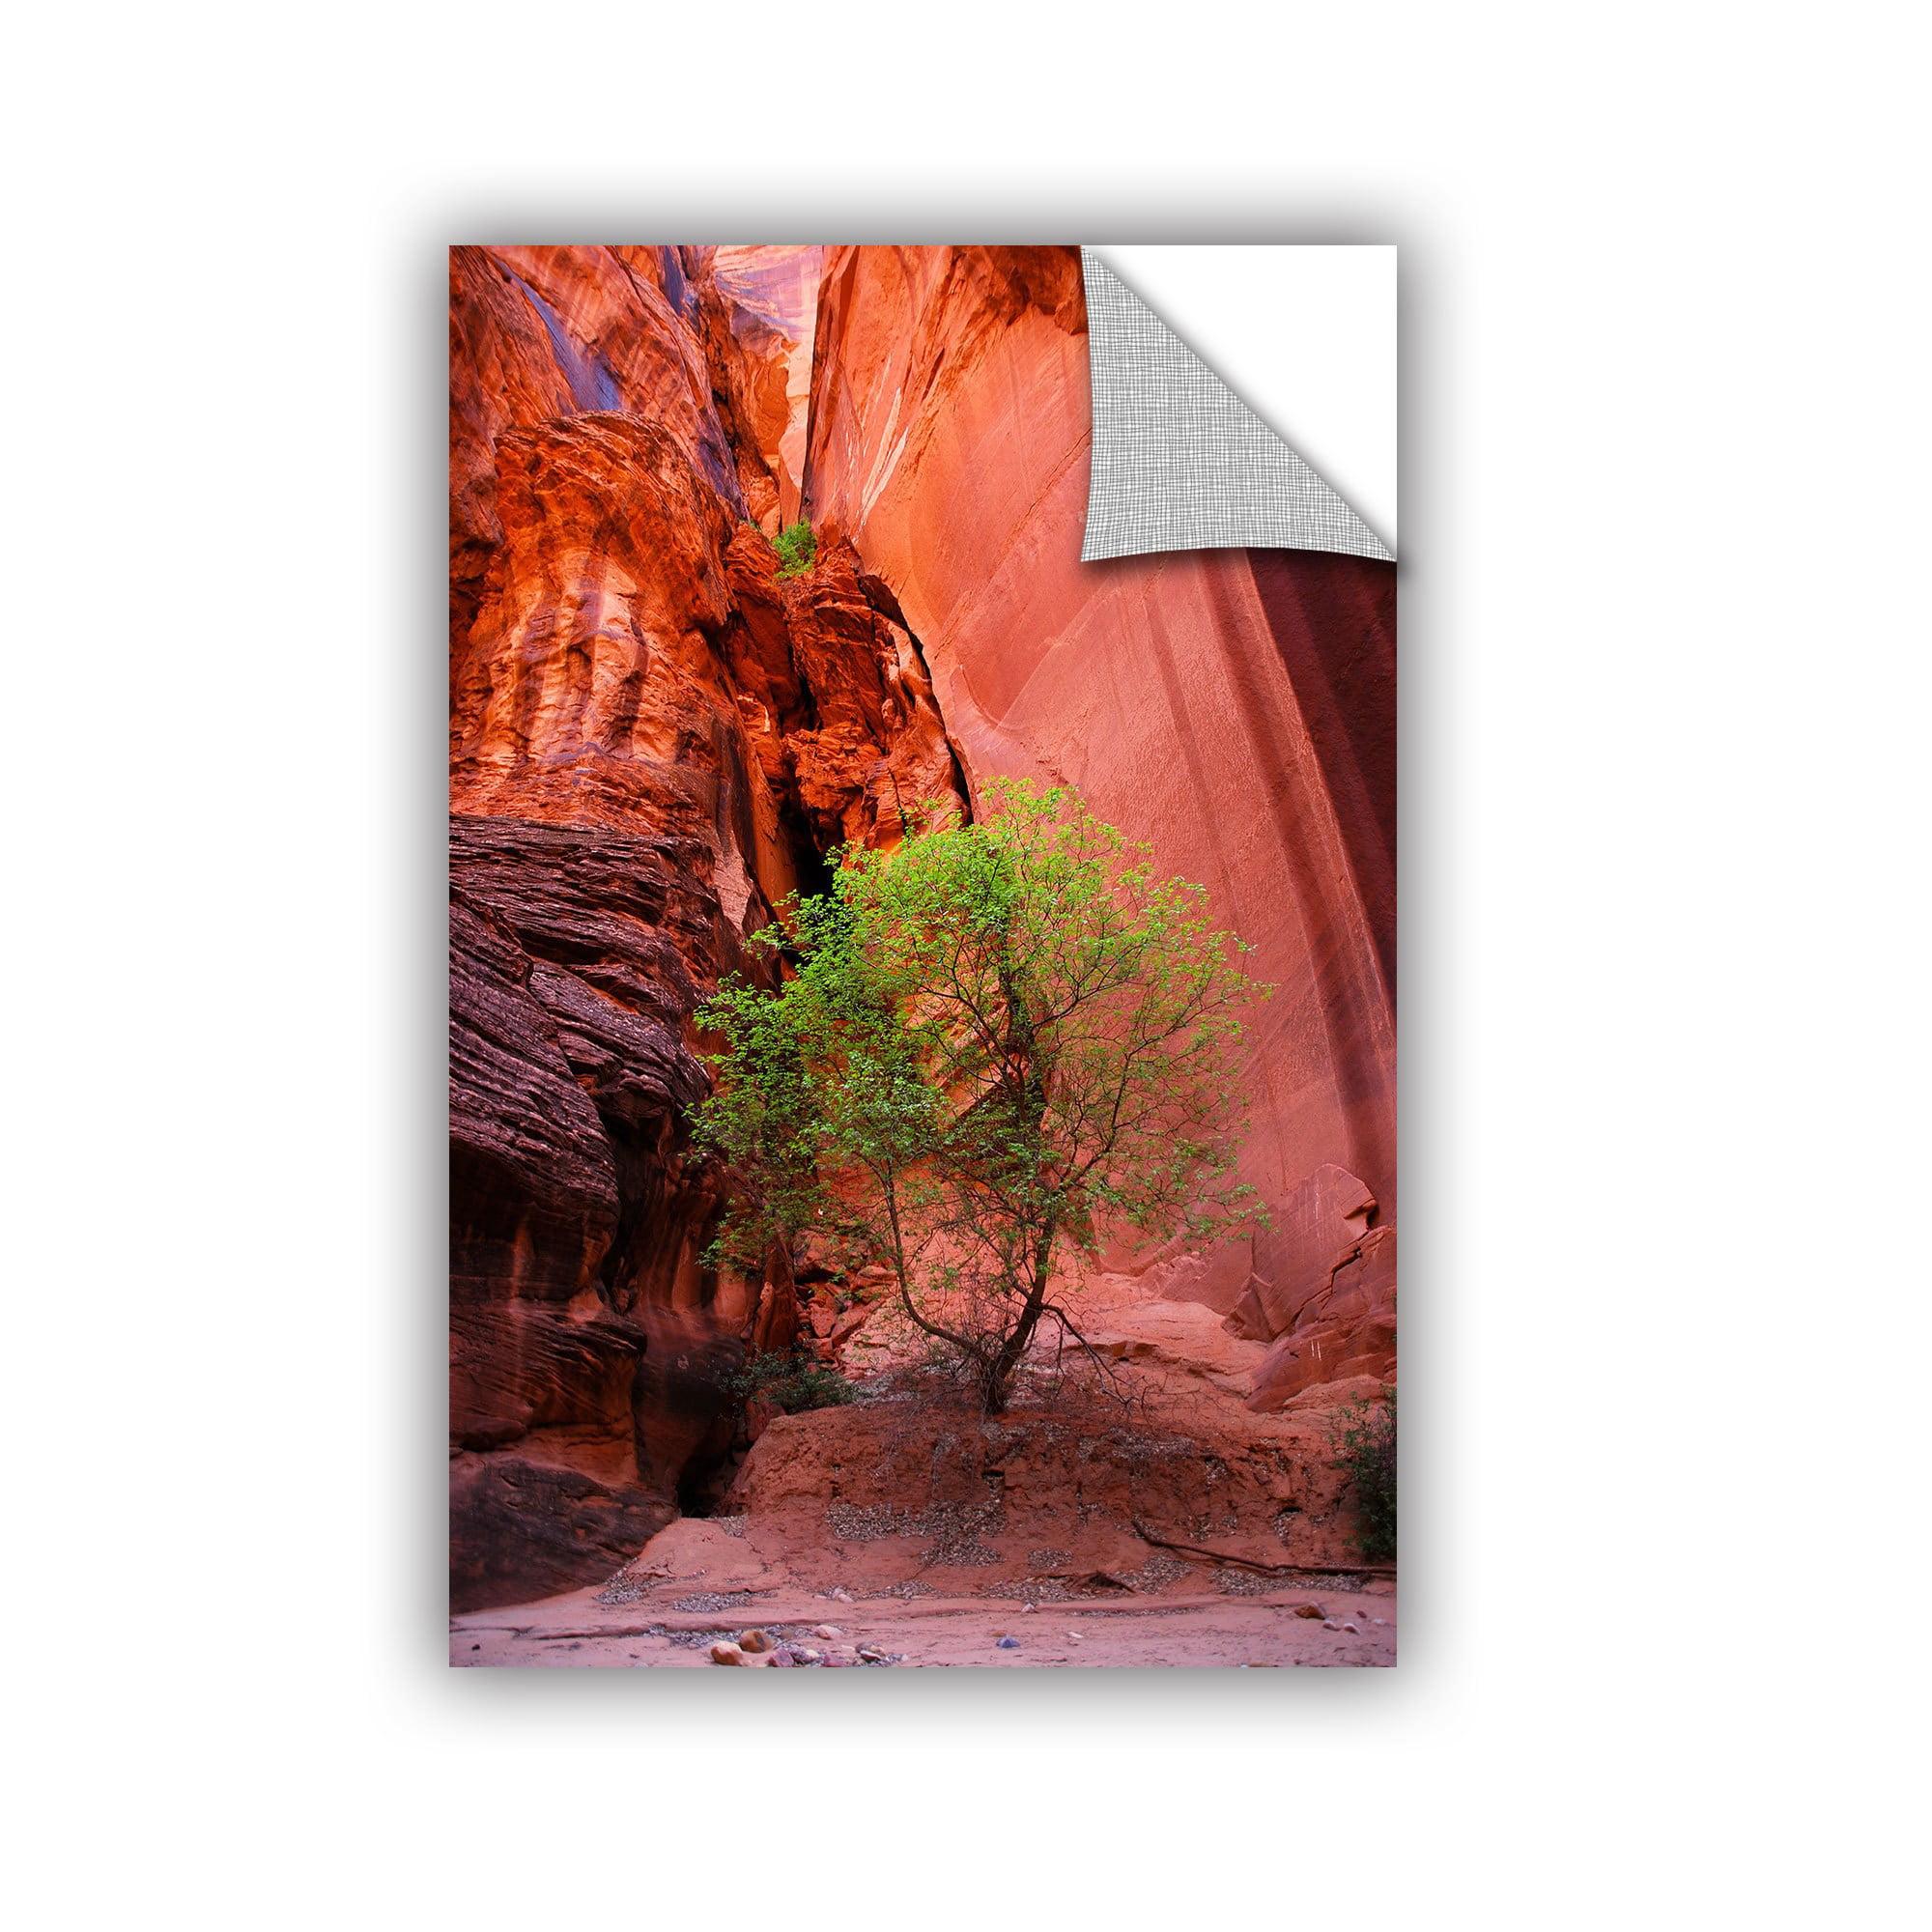 Artwall Dan Wilson Utah Green Tree Red Canyon Artappealz Removable Wall Art Walmart Com Walmart Com